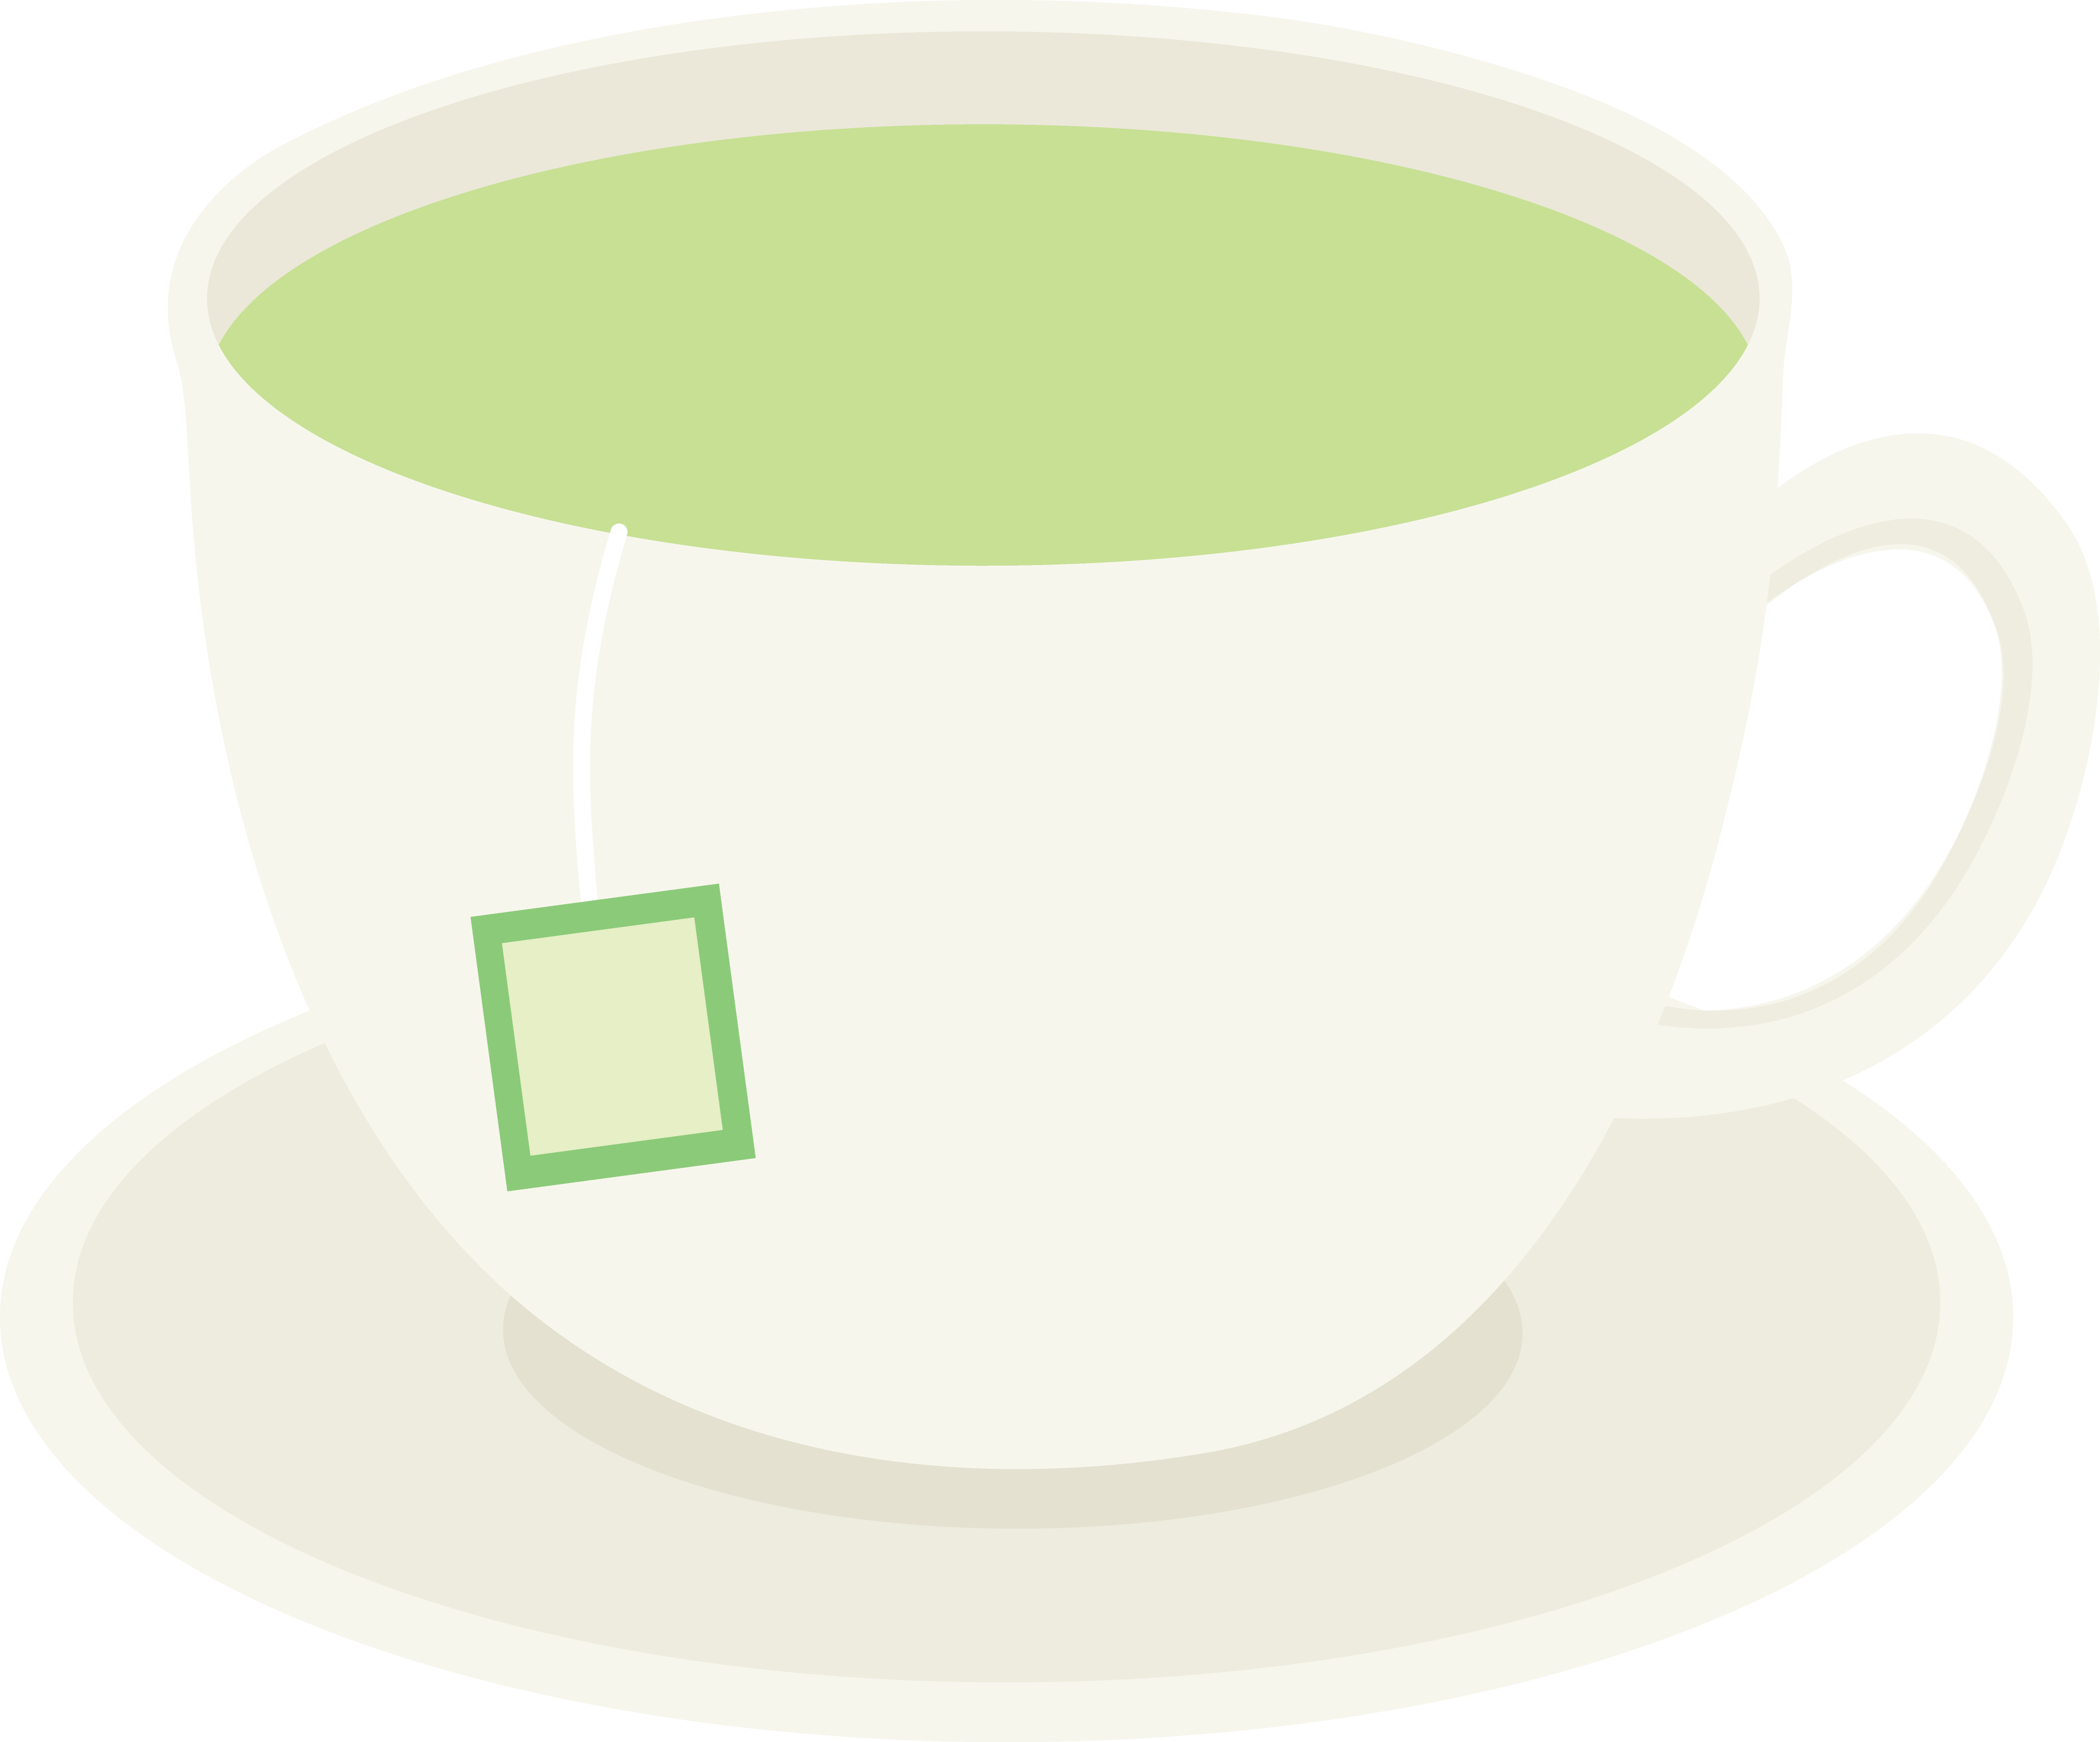 Cup of Healthy Green Tea.